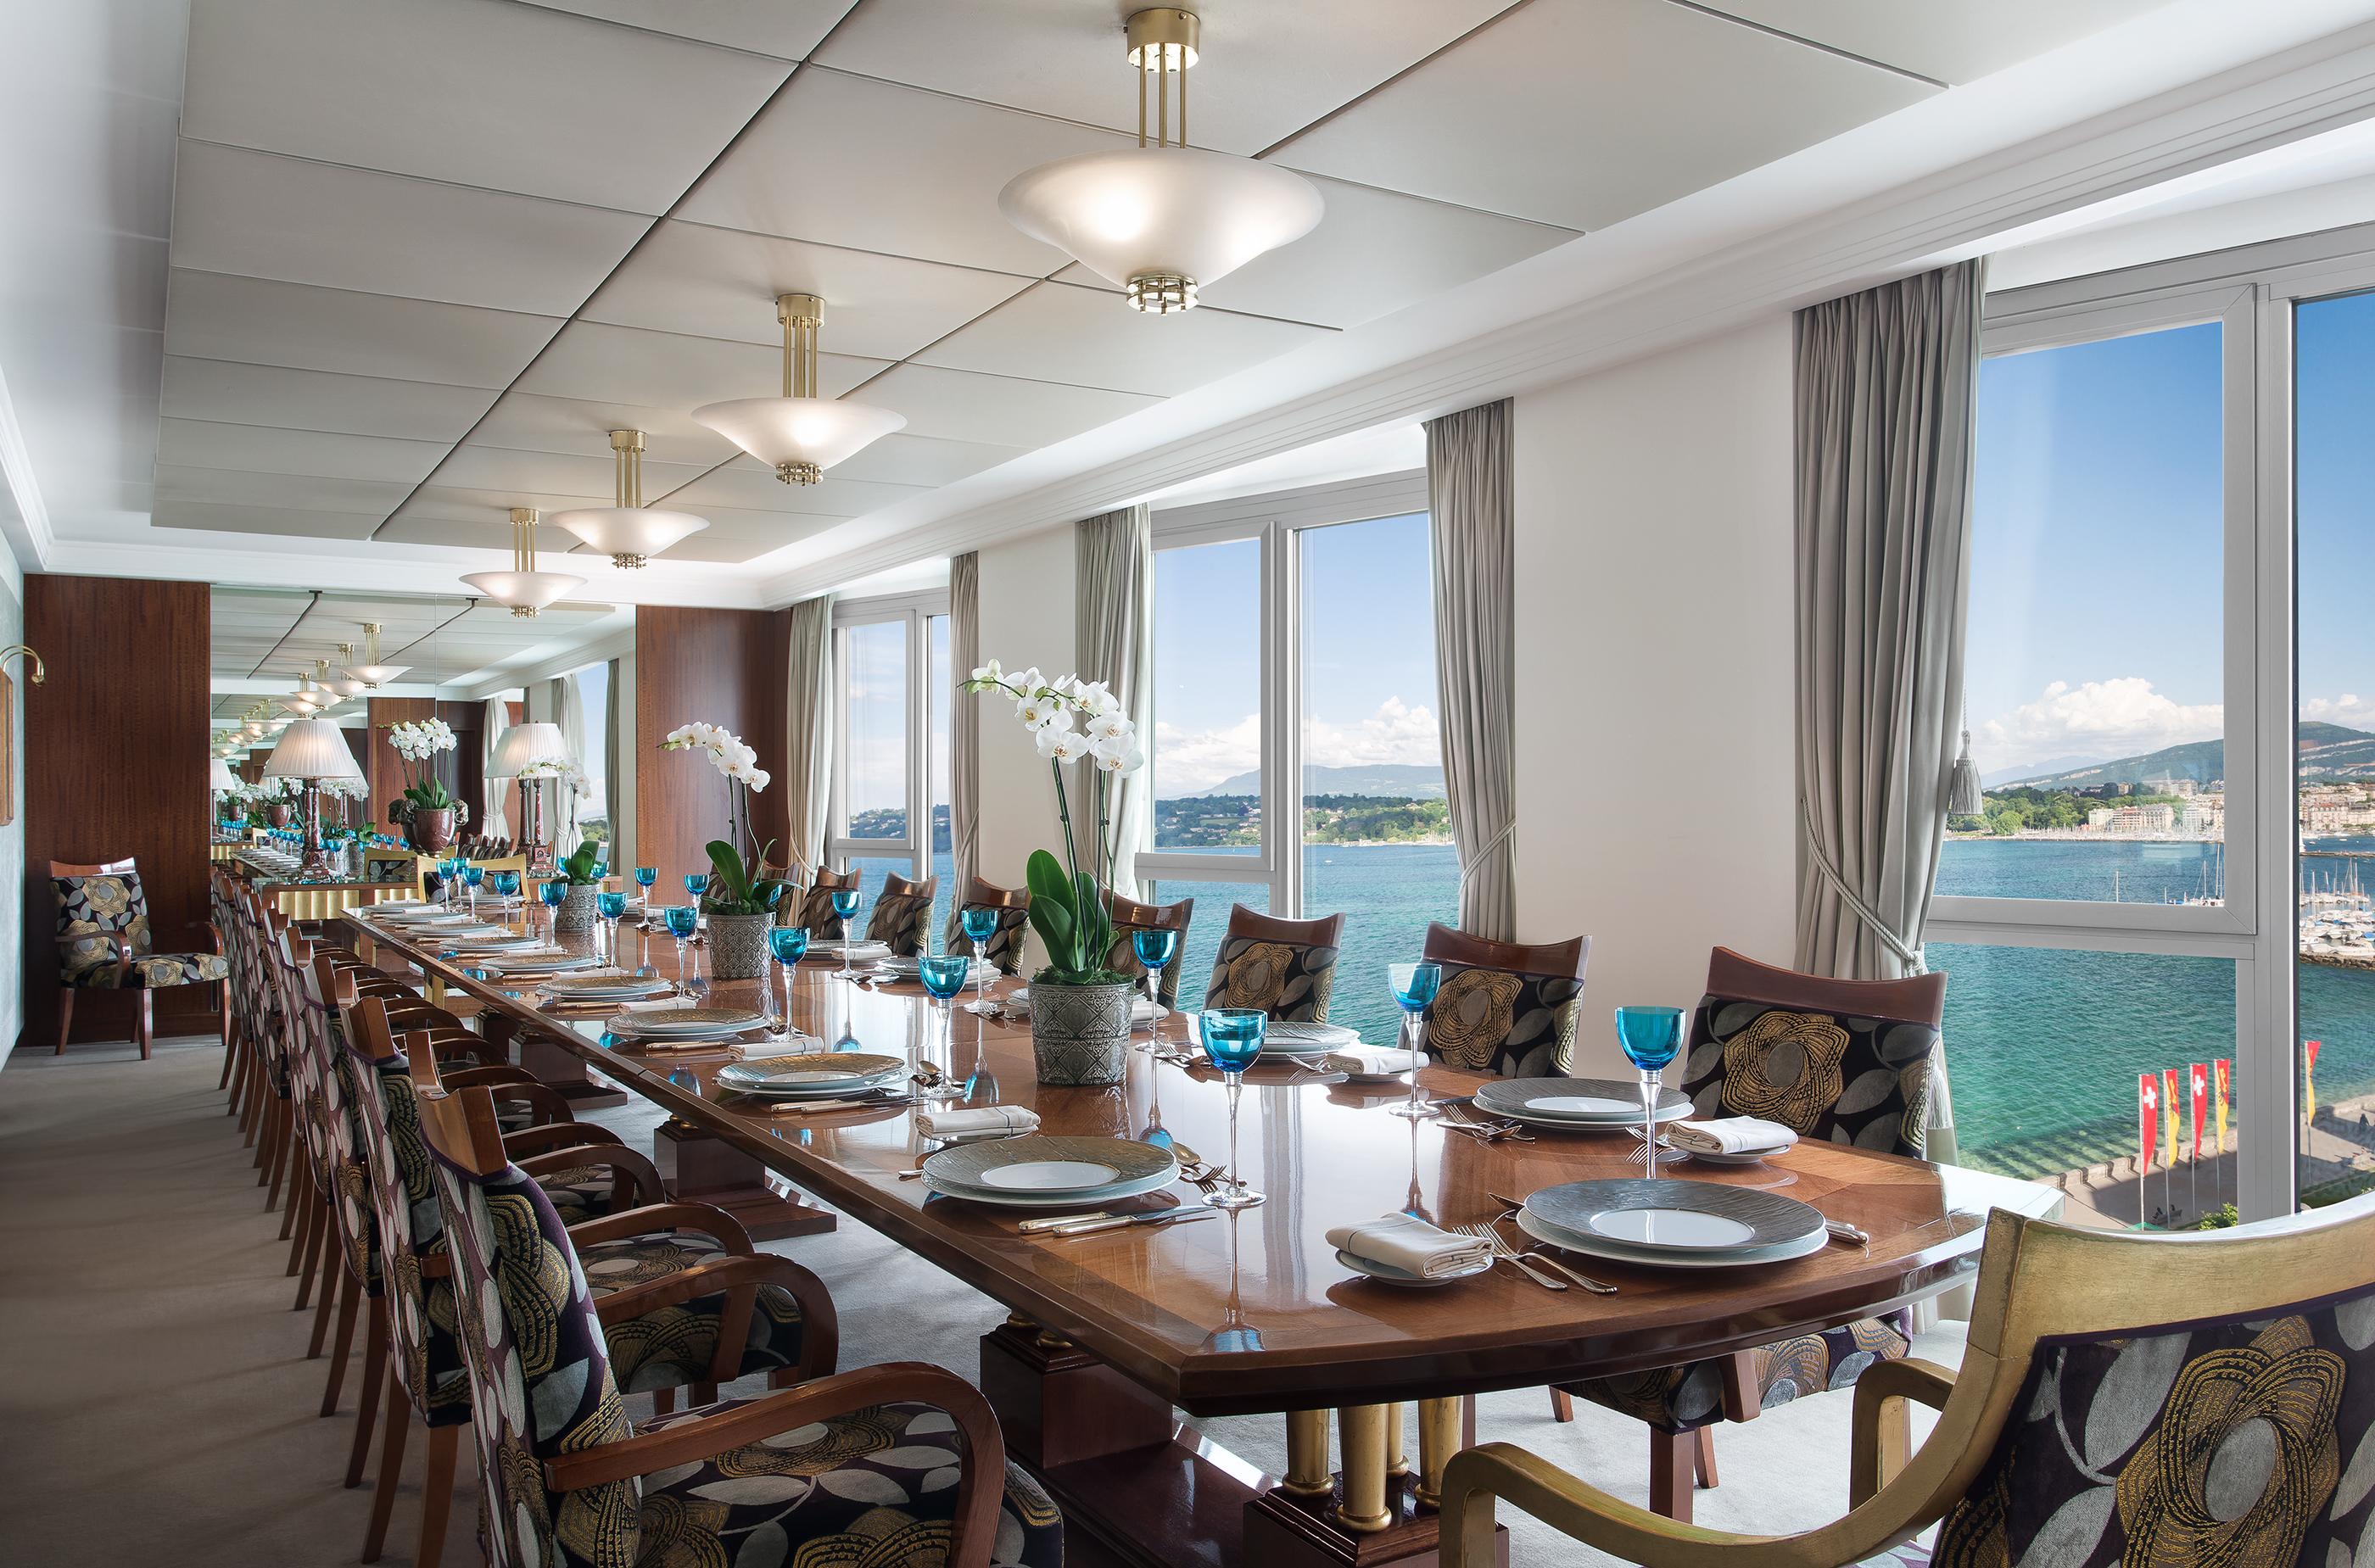 171102-lavish-hotel-rooms-hotel-president-wilson-royal-penthouse-suite-geneva